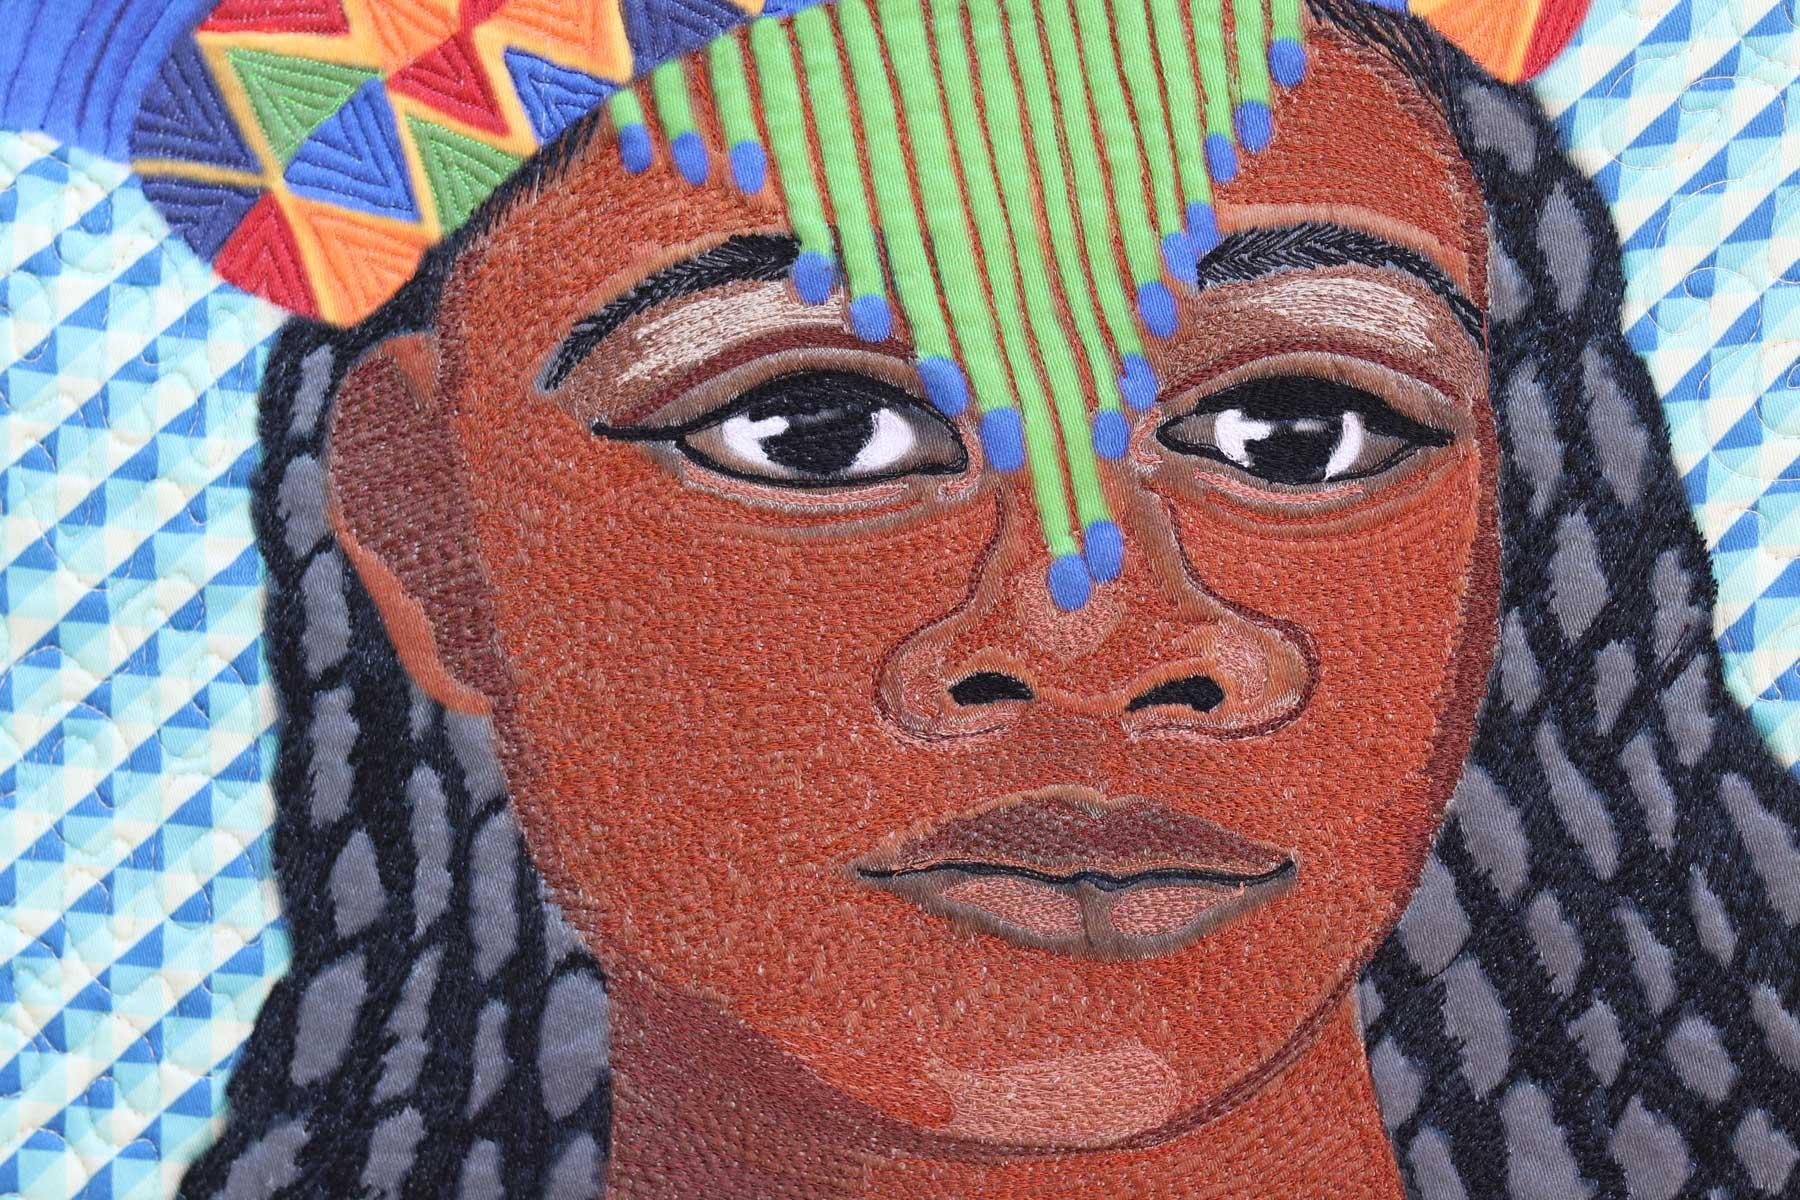 Amandla - The Empowered Woman,| Textile art| Fiber Art